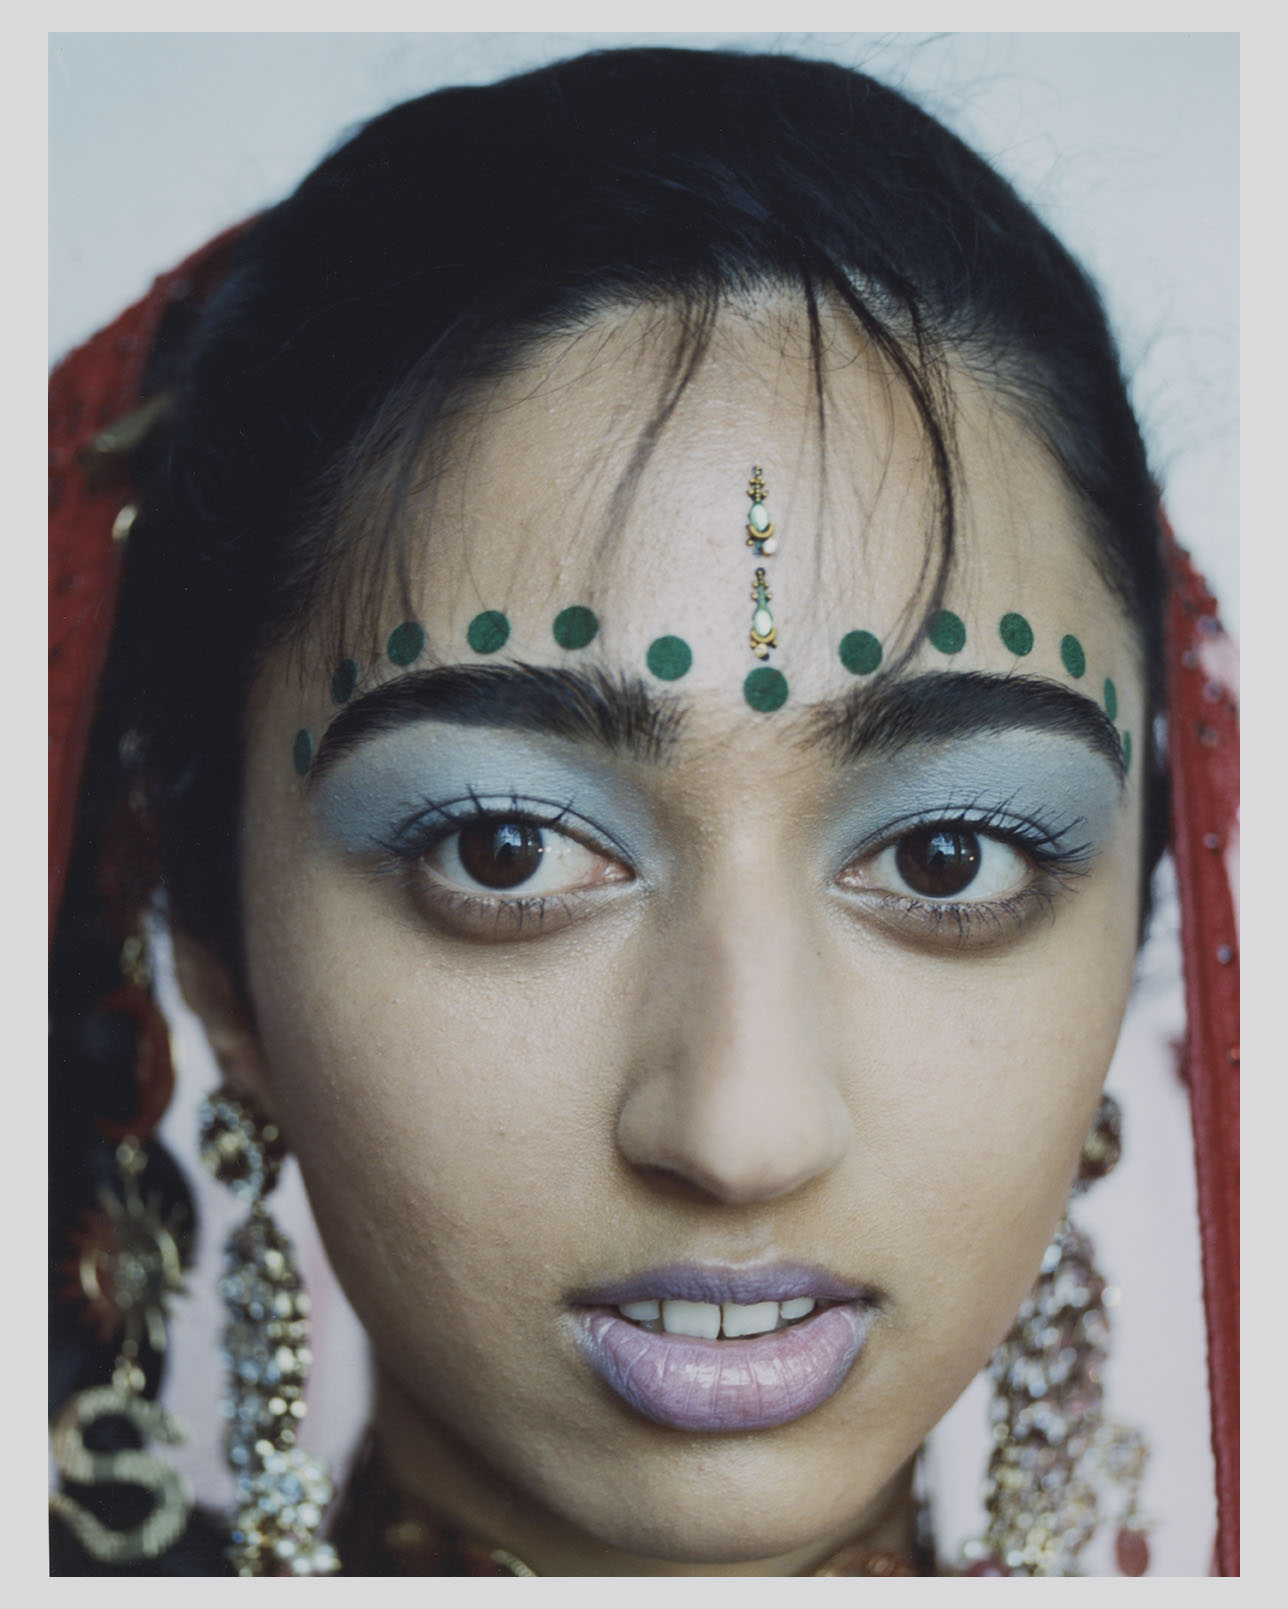 01-Bollywood-Personne-2020-SarahStedeford–Nisha- copy